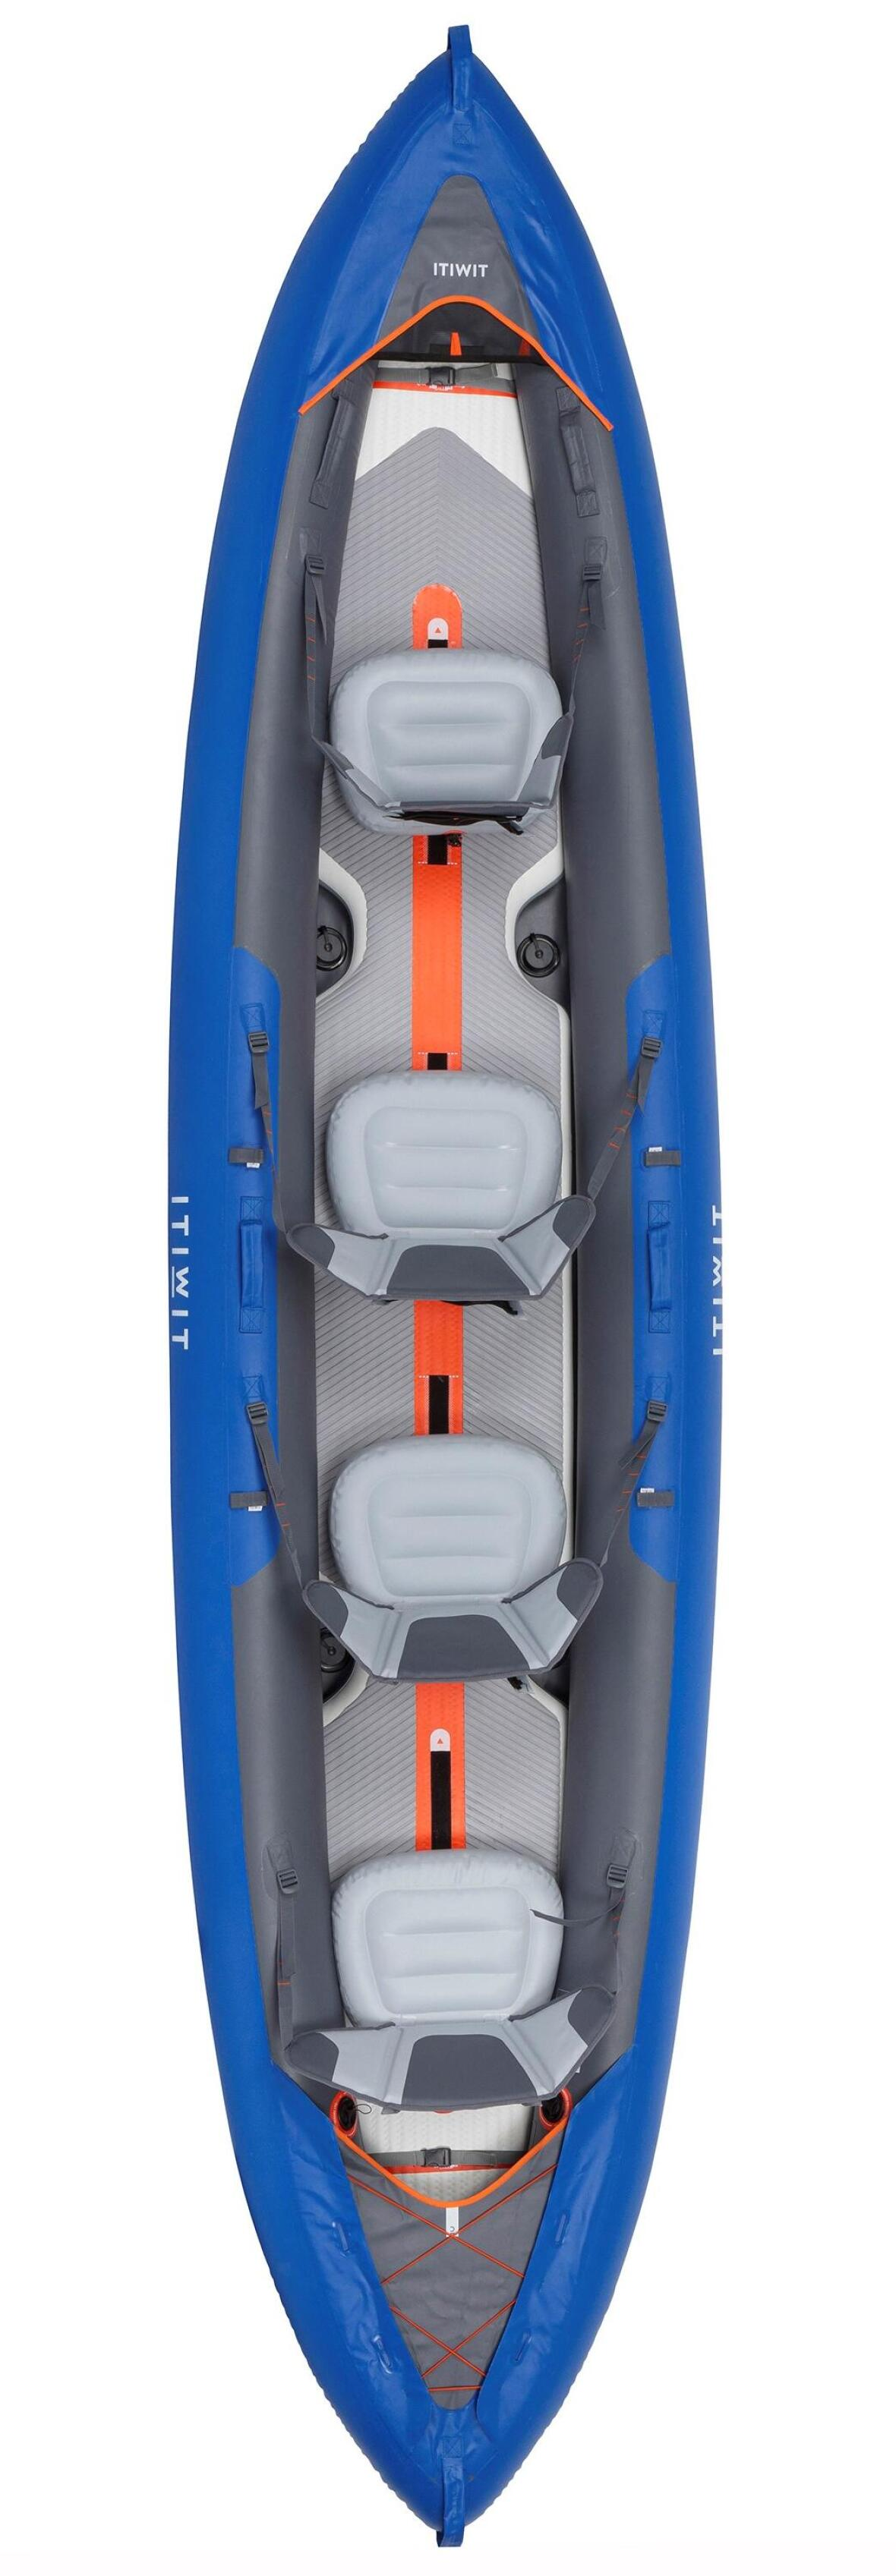 kayak_gonflable_randonnee-fond-hp-droptstitch-4-places-itiwit-bleu-decathlon